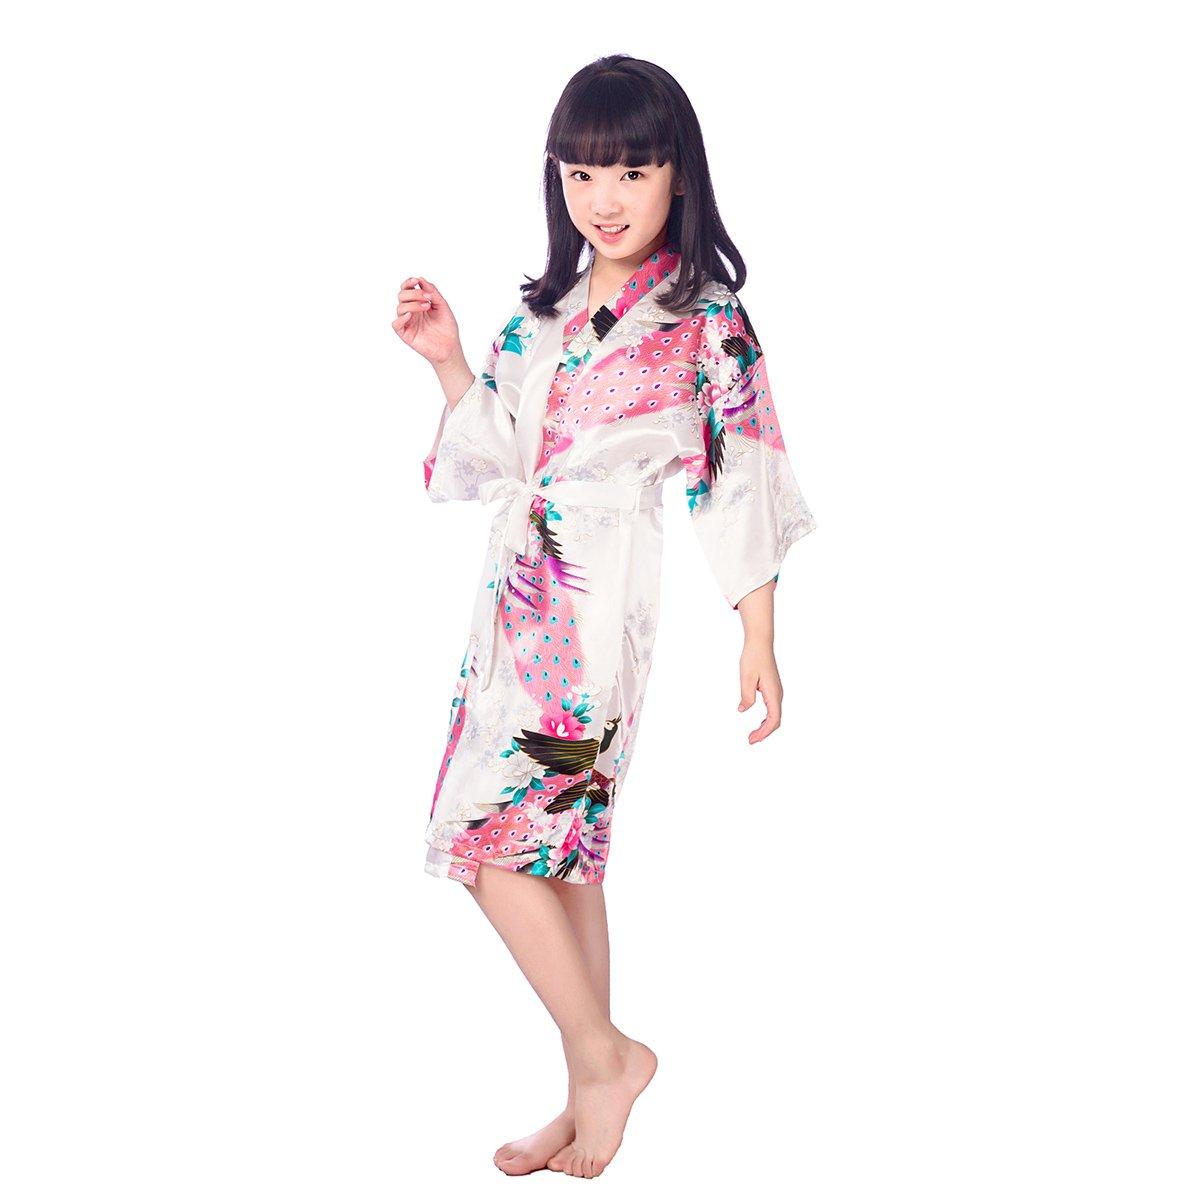 Size 10 LUOEM Kids Kimono Robe Spa Flower Pattern Bathrobe Nightgown for Party Birthday